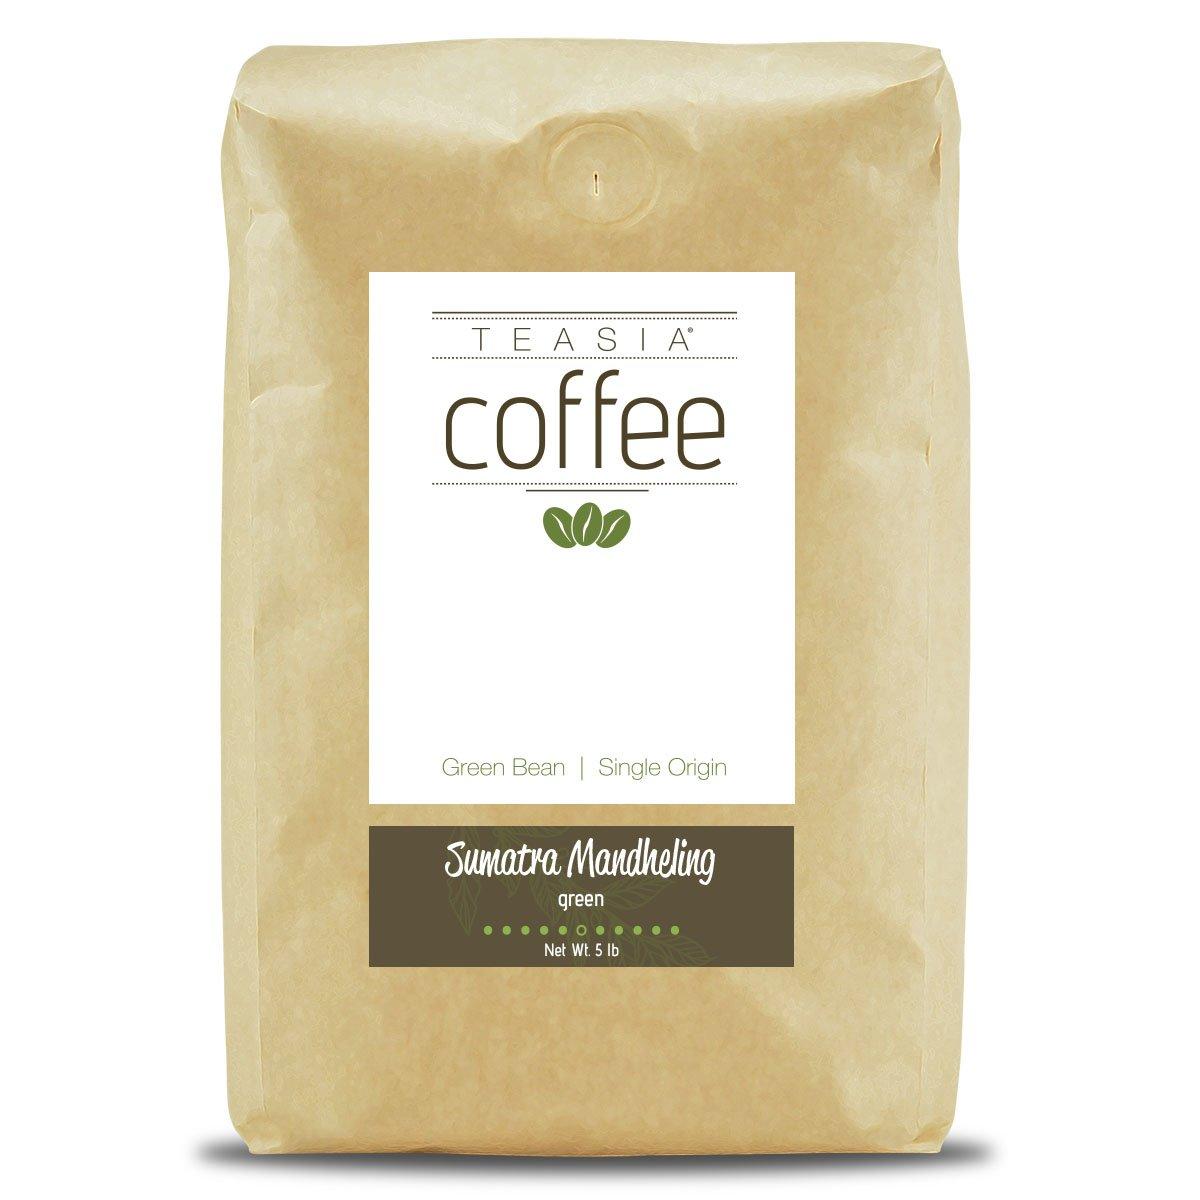 Teasia Coffee, Sumatra Mandheling, Single Origin, Green Unroasted Whole Coffee Beans, 5-Pound Bag by Teasia